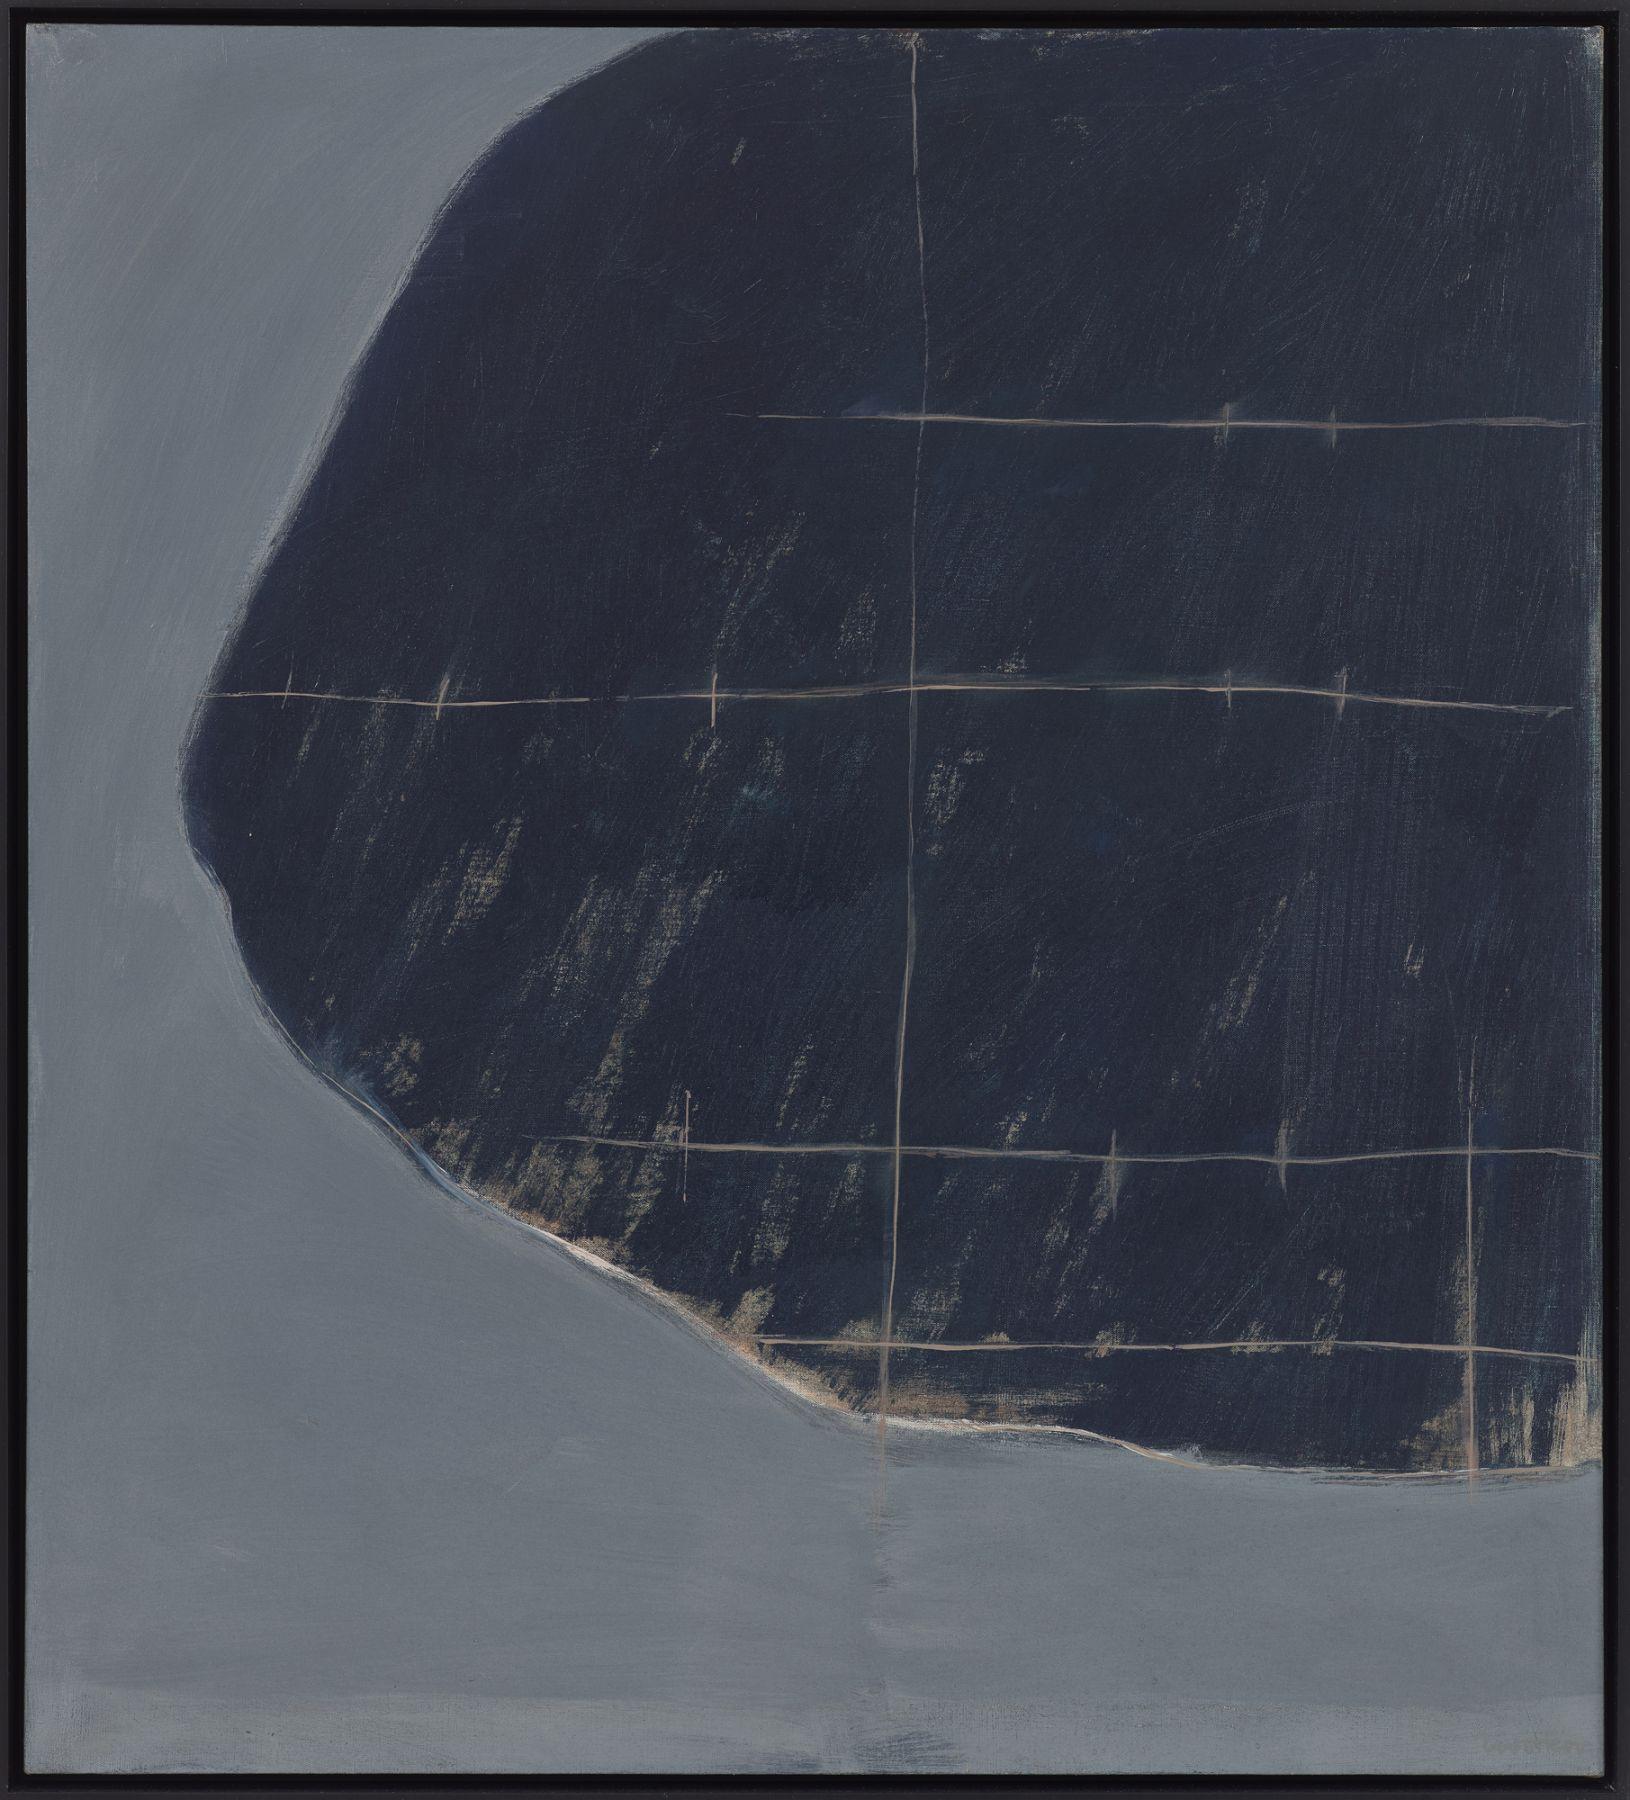 Jack Tworkov, Entry, 1965-1967